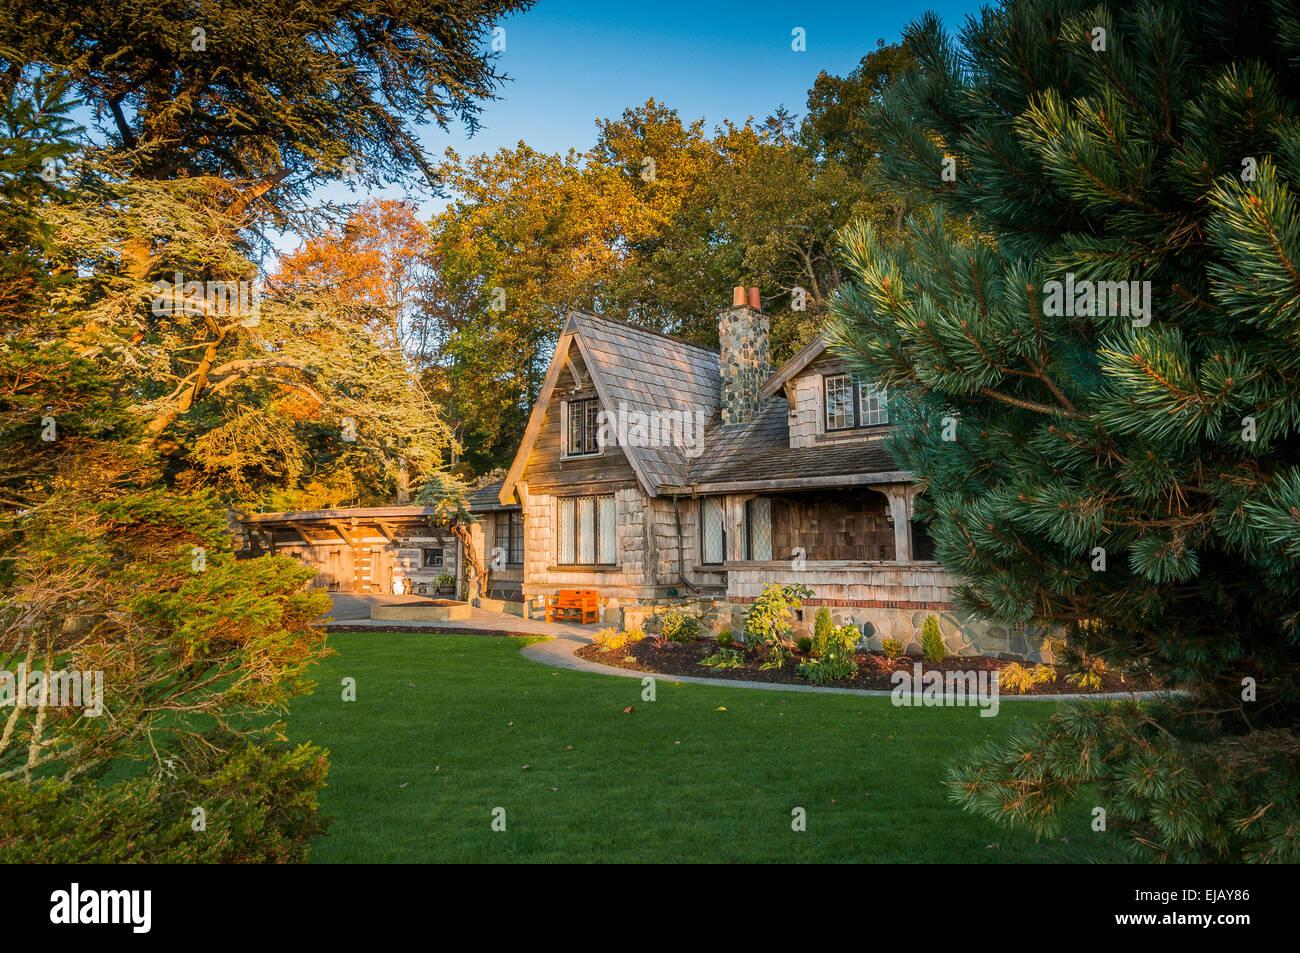 Filberg Heritage Lodge and Park, Comox, British Columbia, Canada - Stock Image